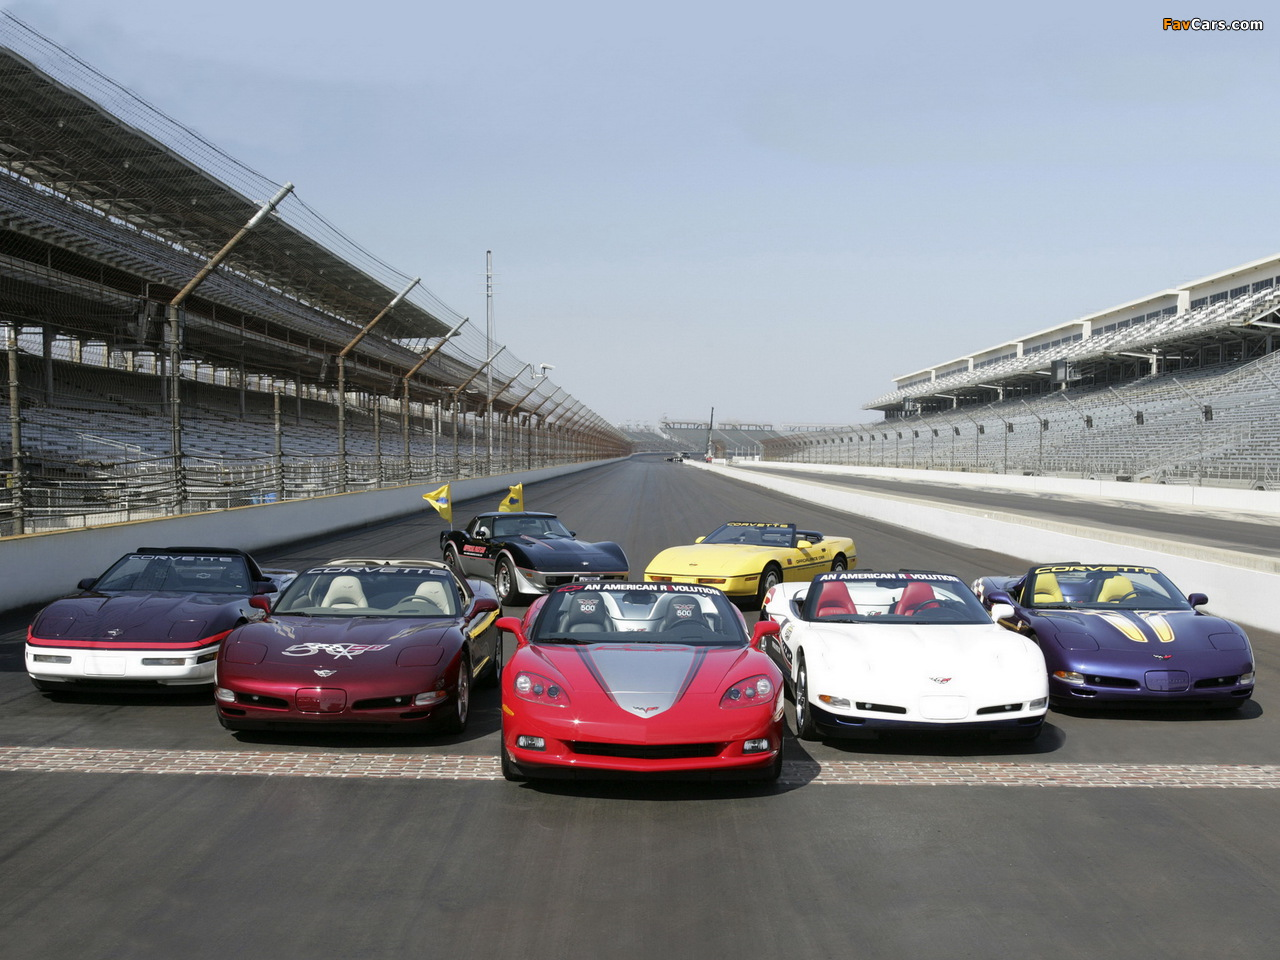 Corvette wallpapers (1280 x 960)